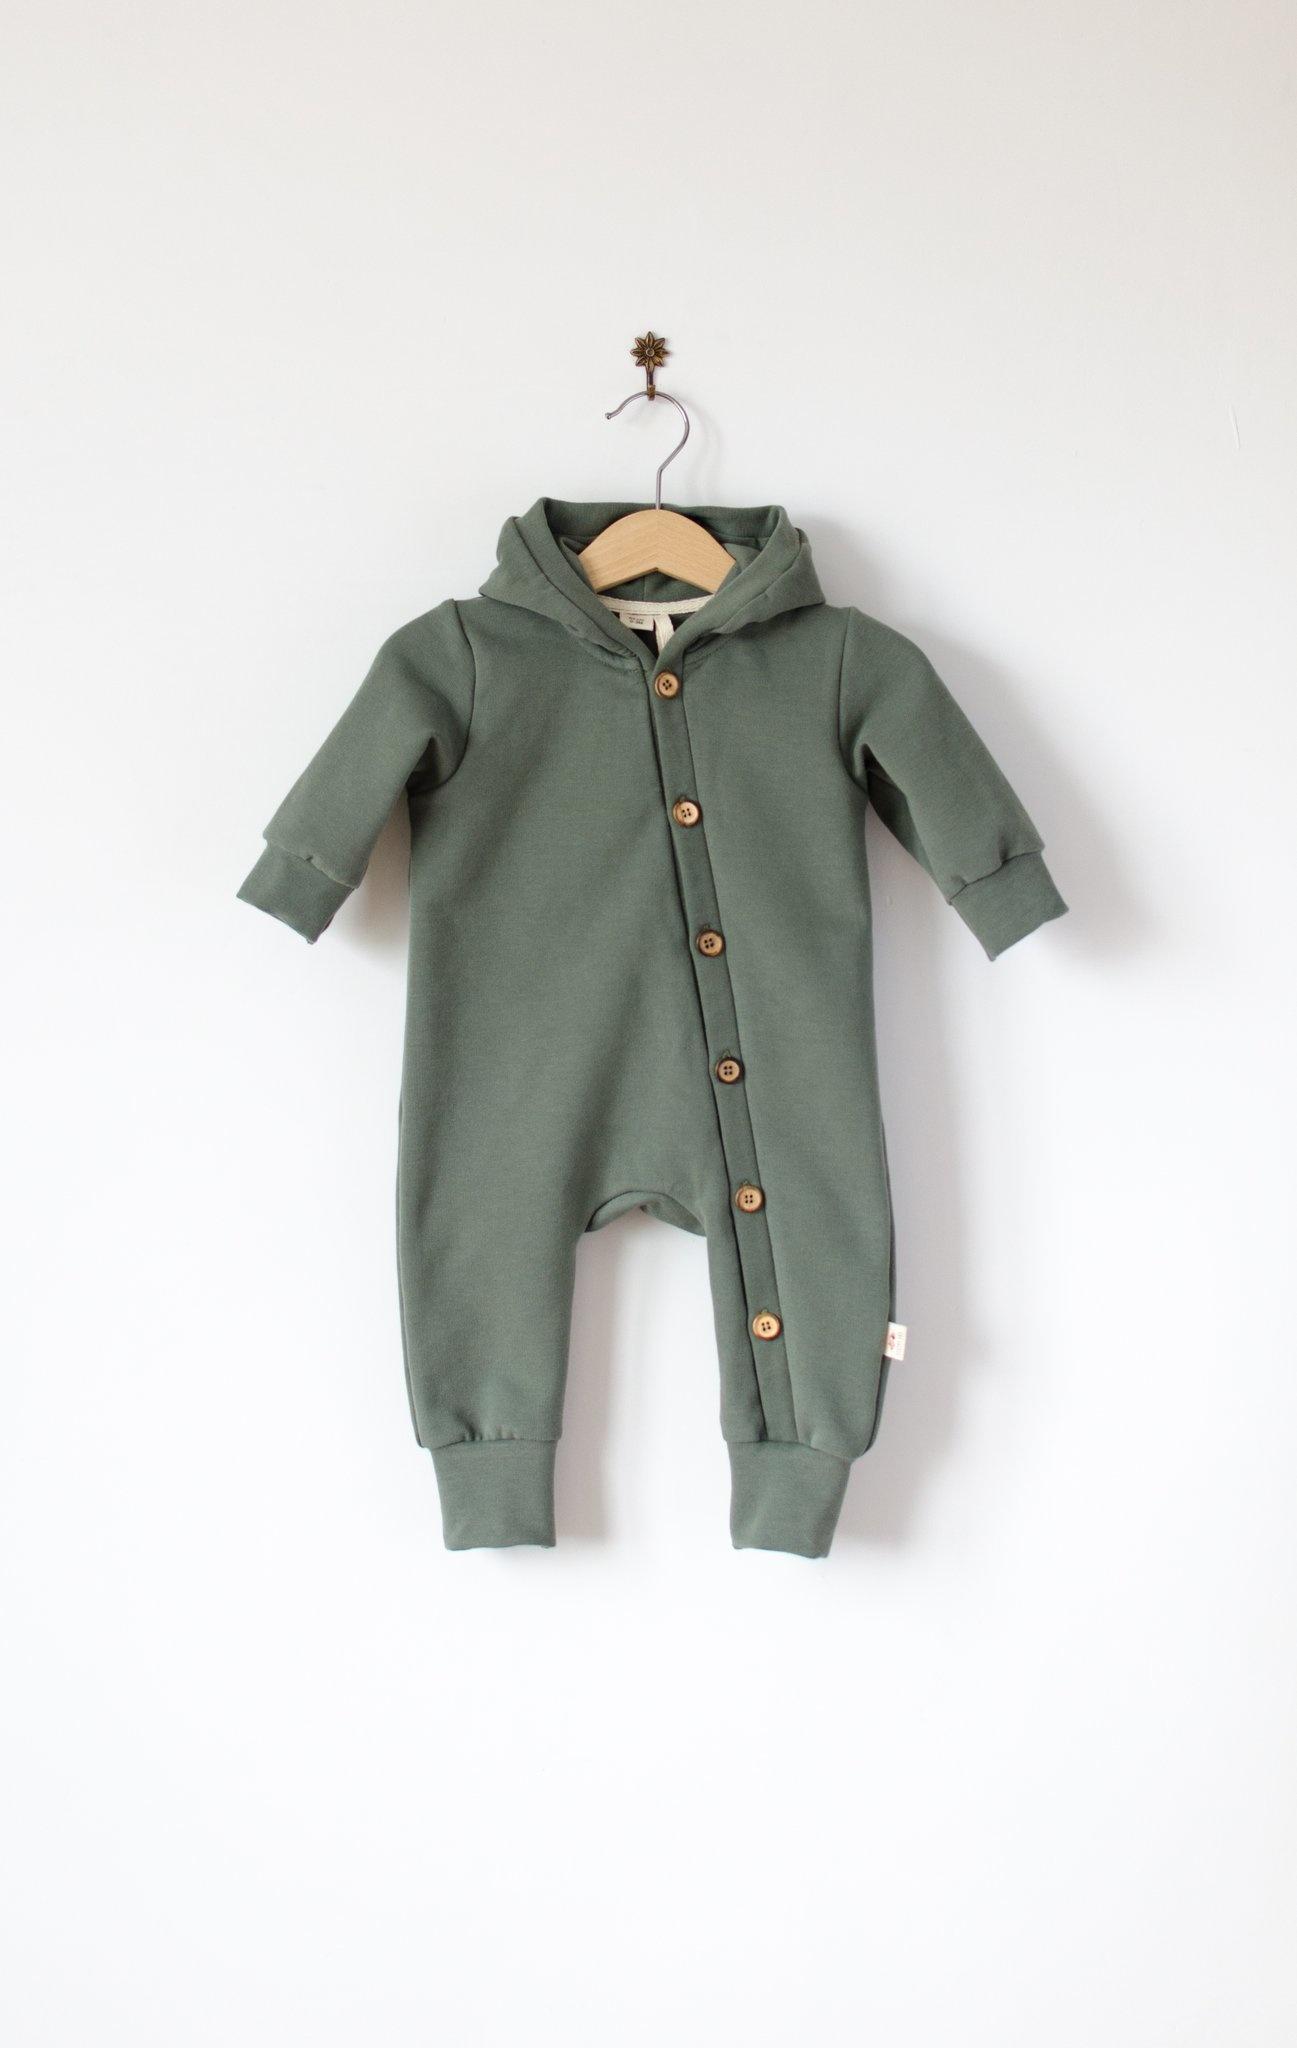 Baby Kapuzenoverall waldgrün mit Holzknöpfen